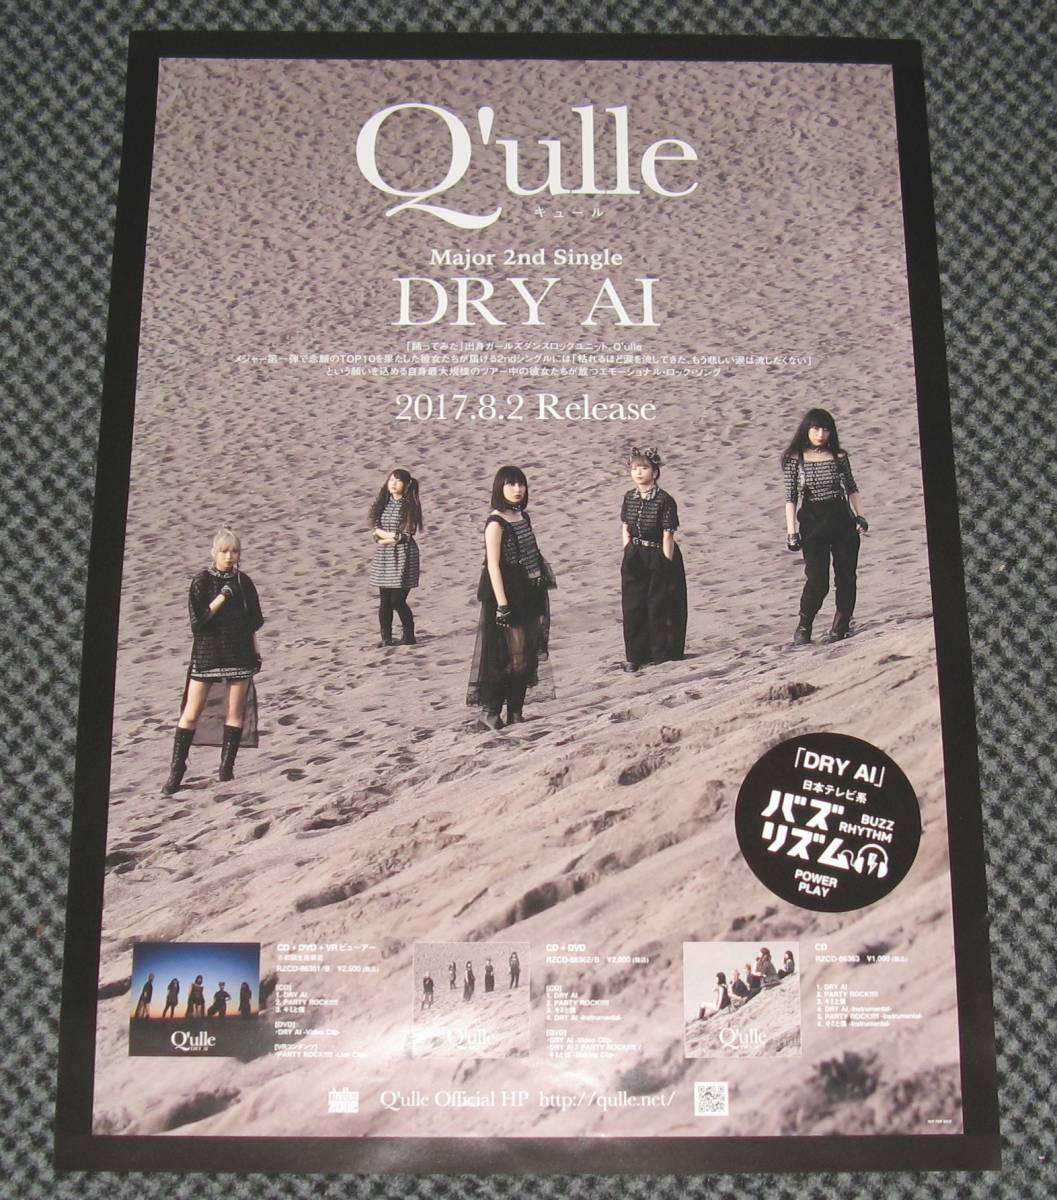 Q'ulle キュール [DRY AI] 告知ポスター